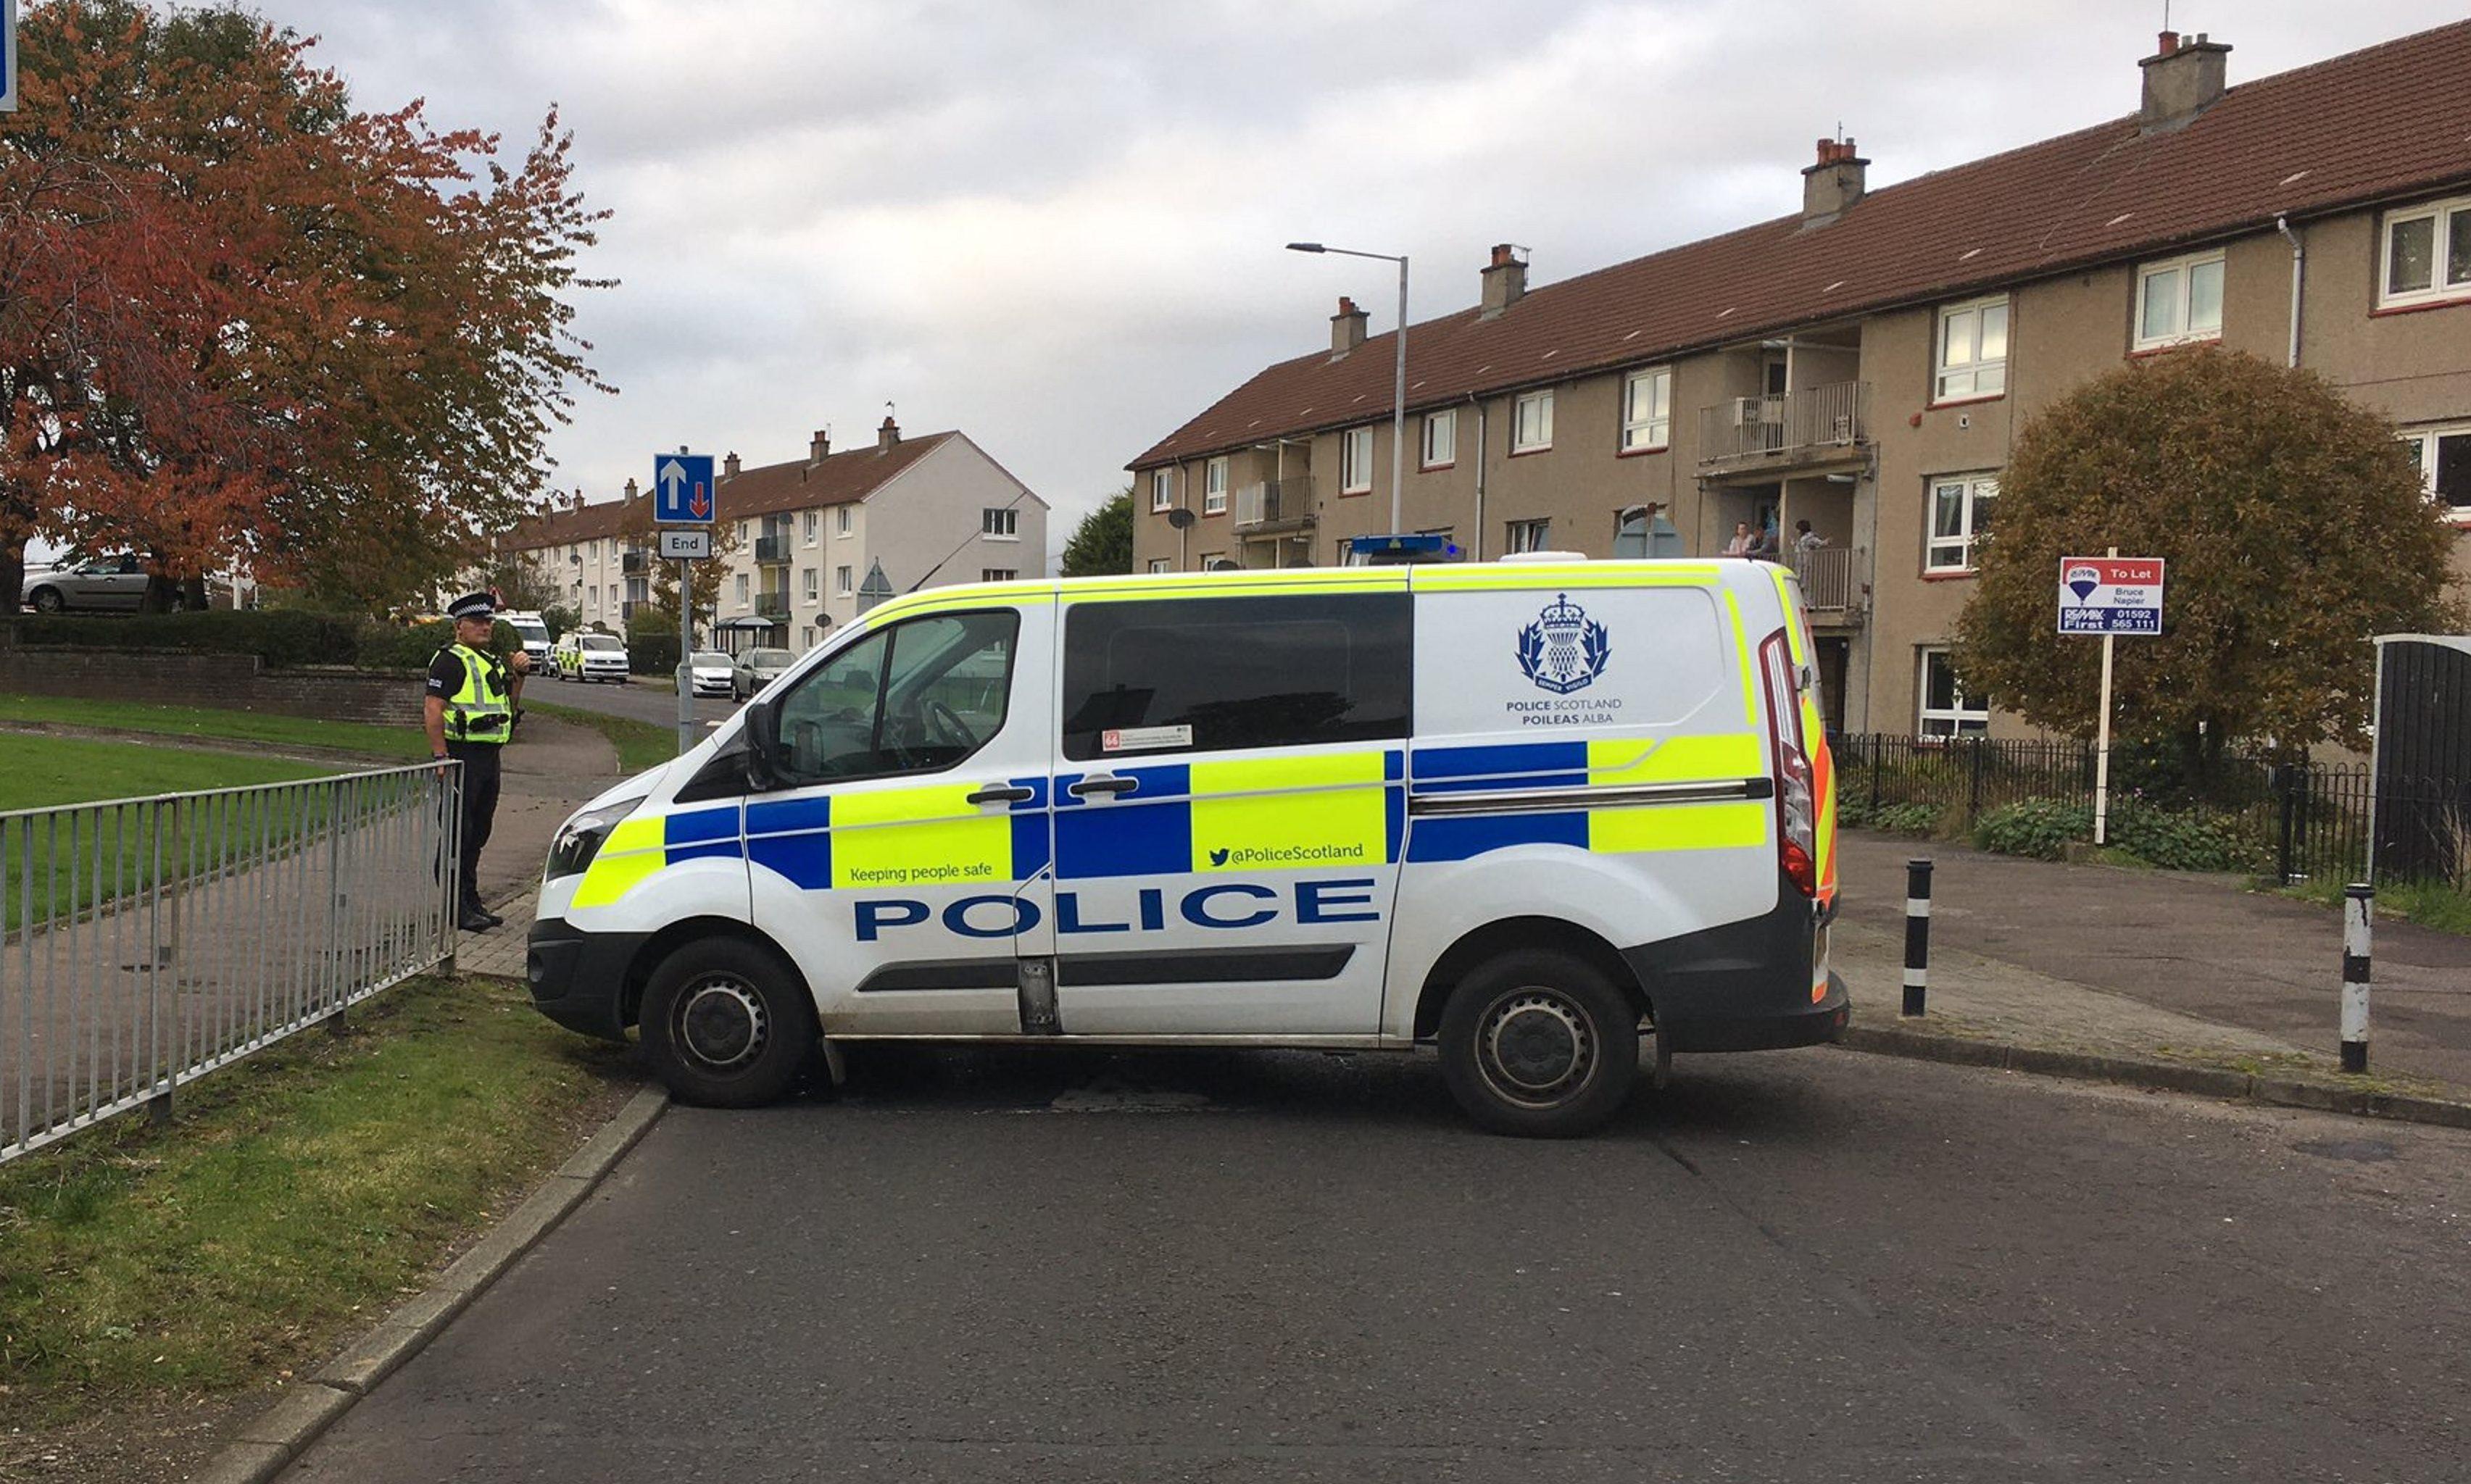 The incident on Fair Isle Road, Kirkcaldy.